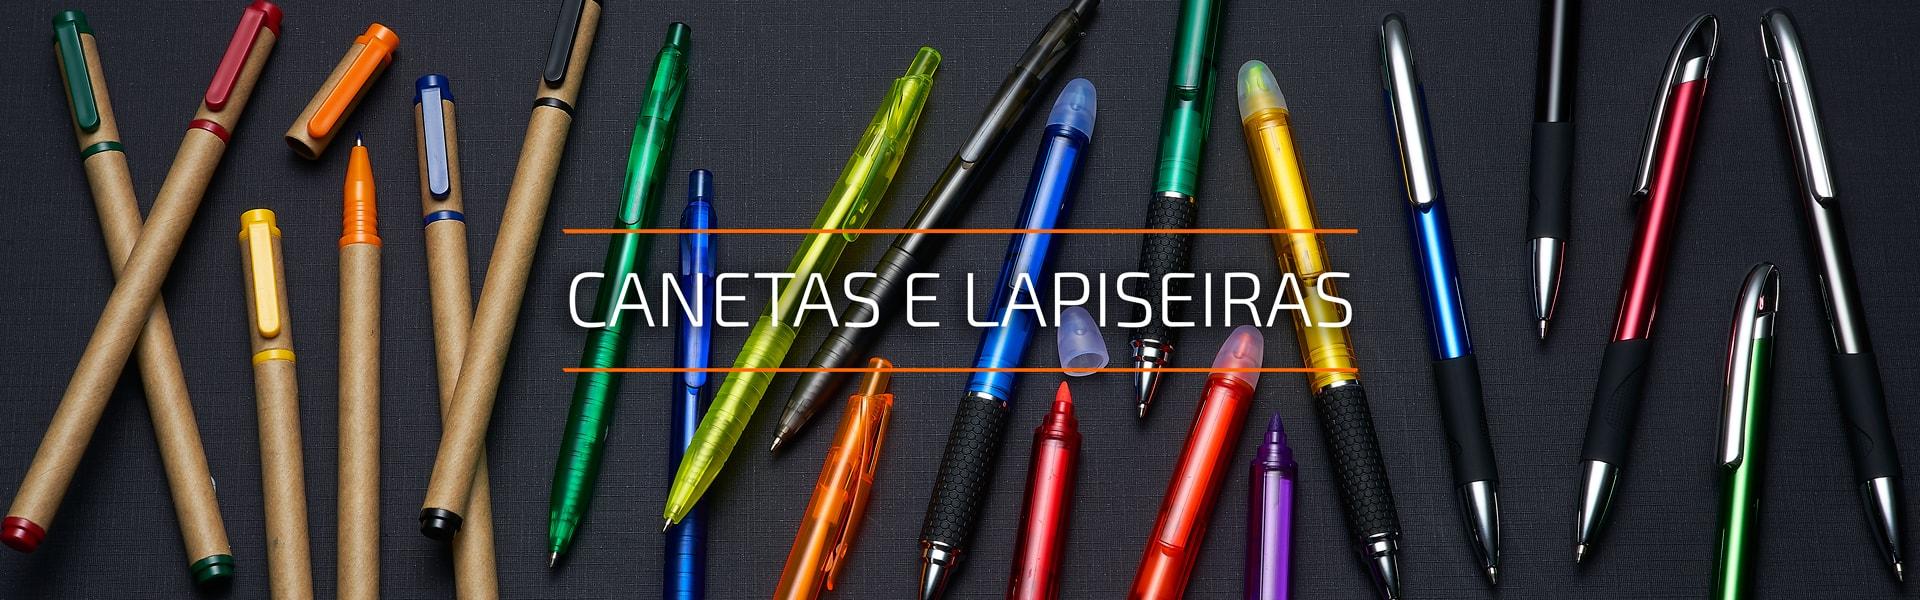 Lápis e Lapiseiras Personalizadas